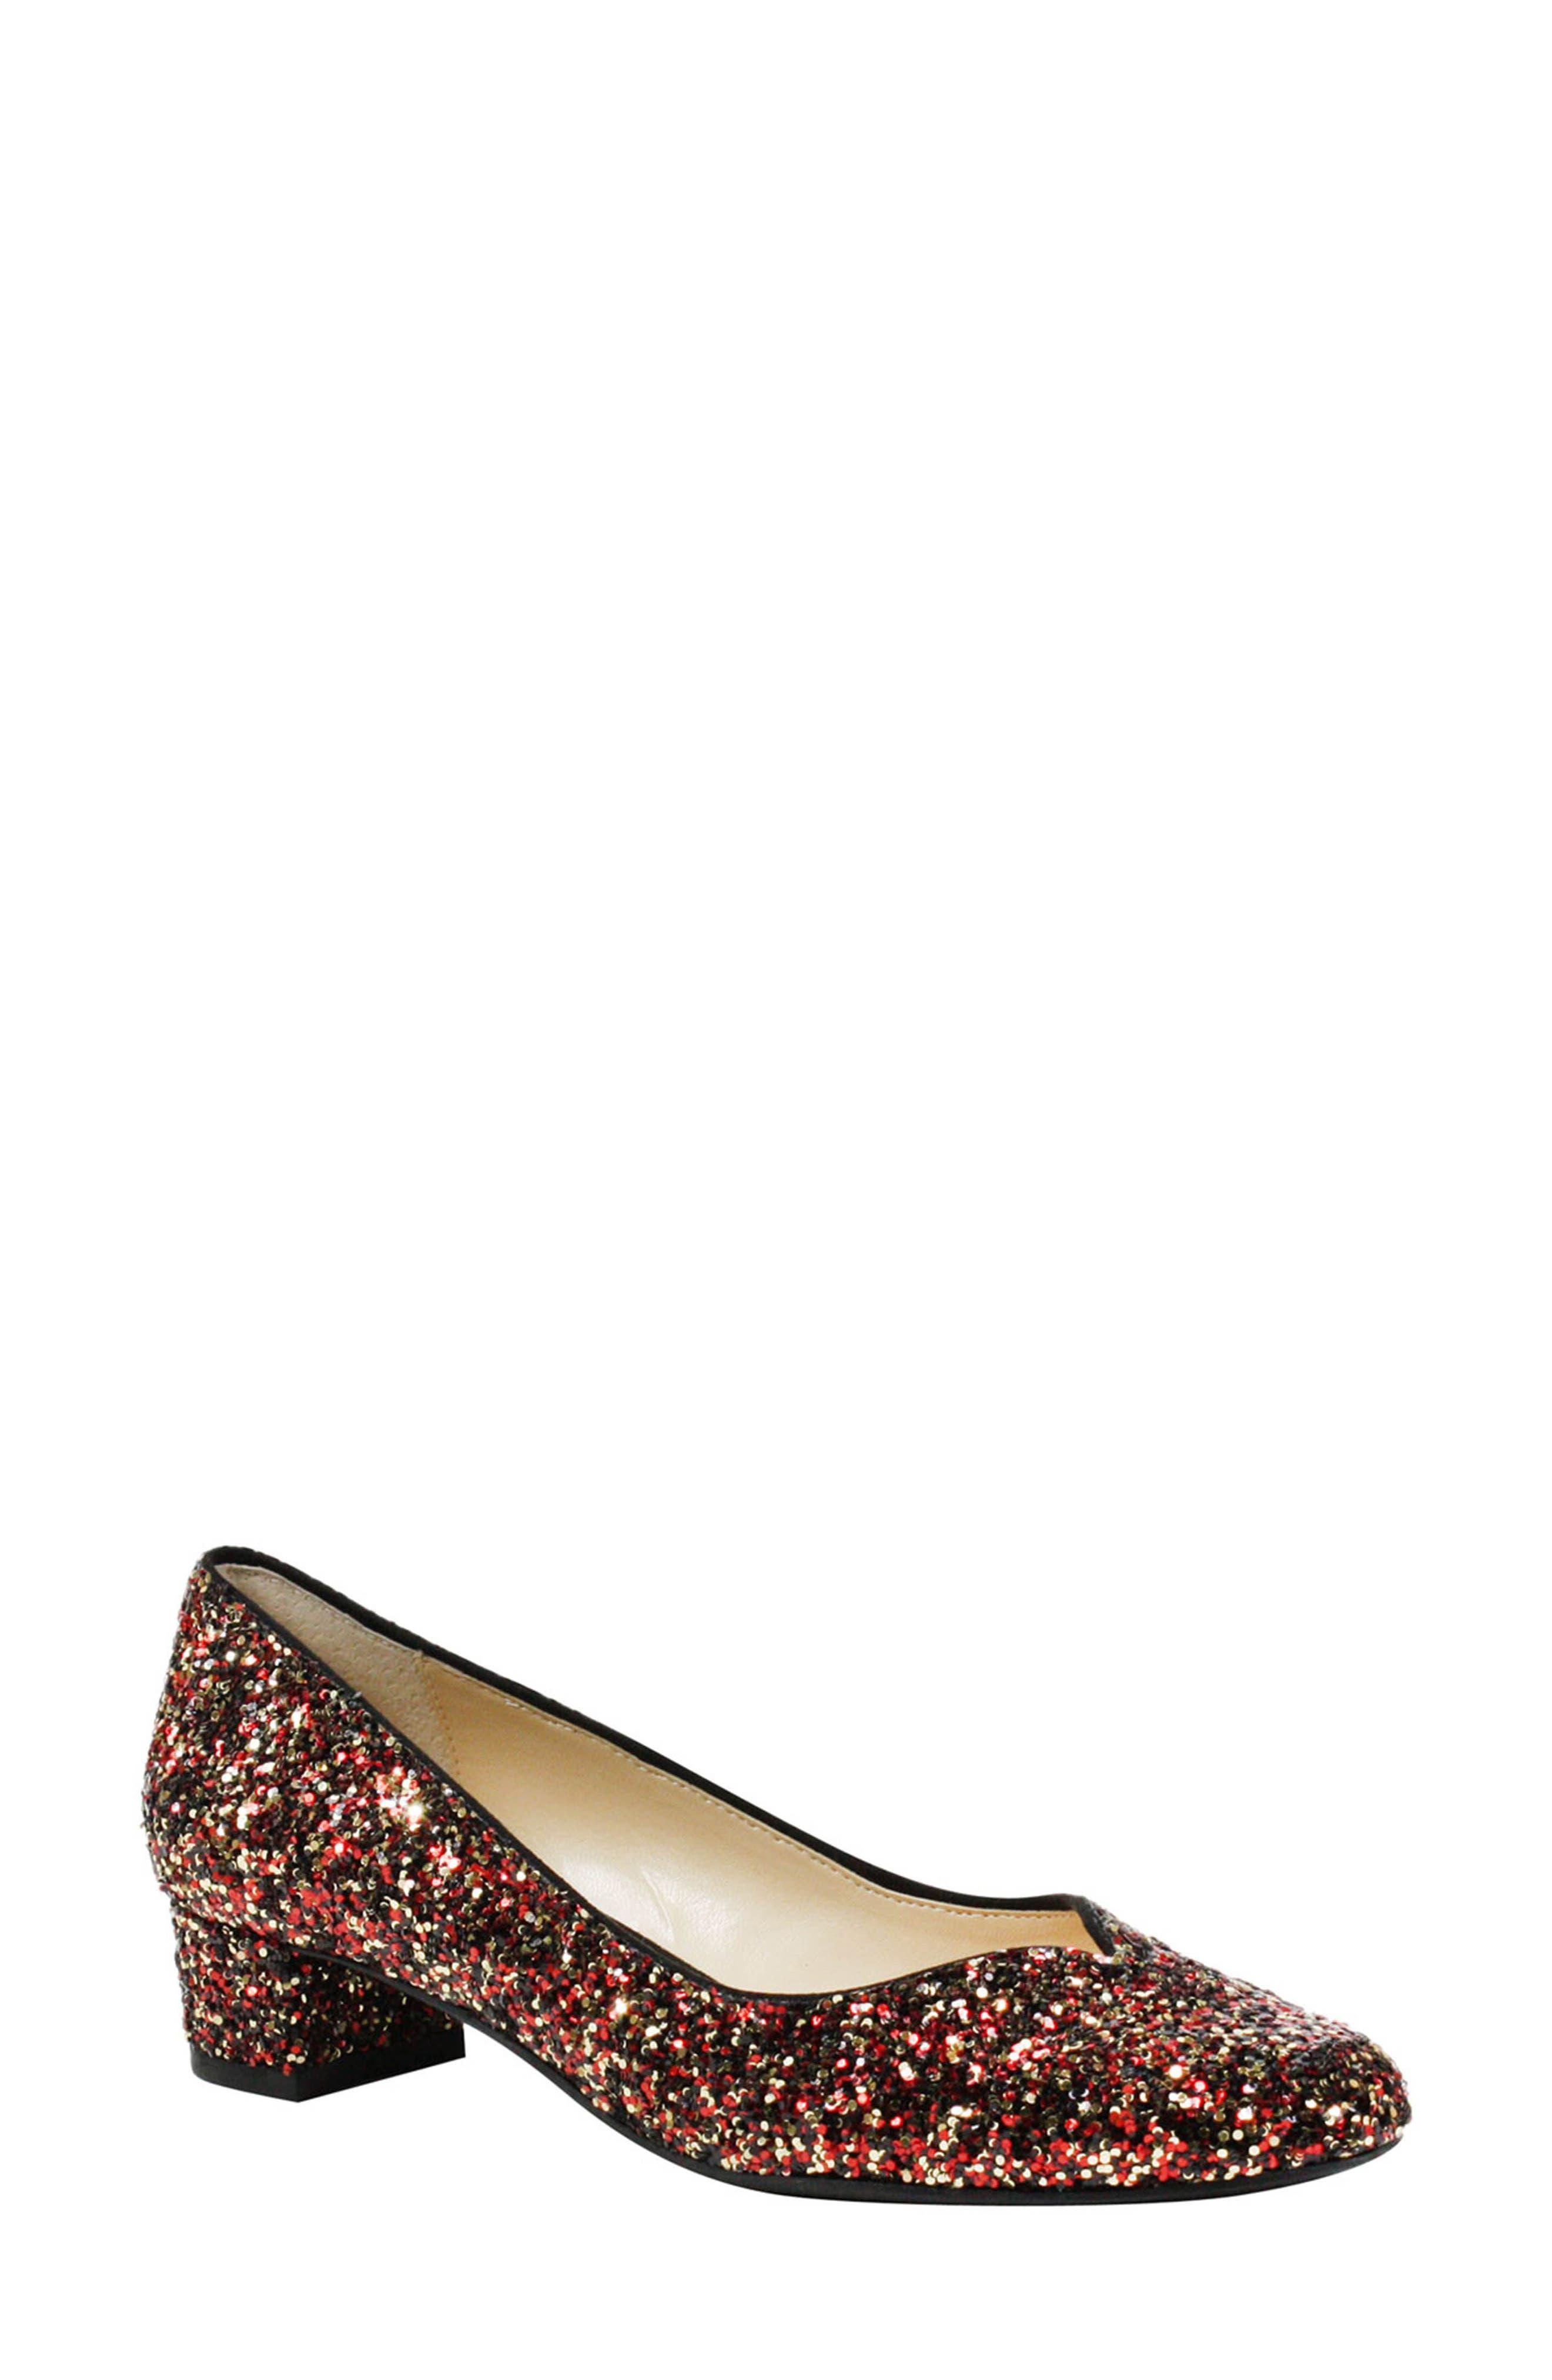 'Bambalina' Block Heel Glitter Pump,                         Main,                         color, Burgundy Glitter Fabric